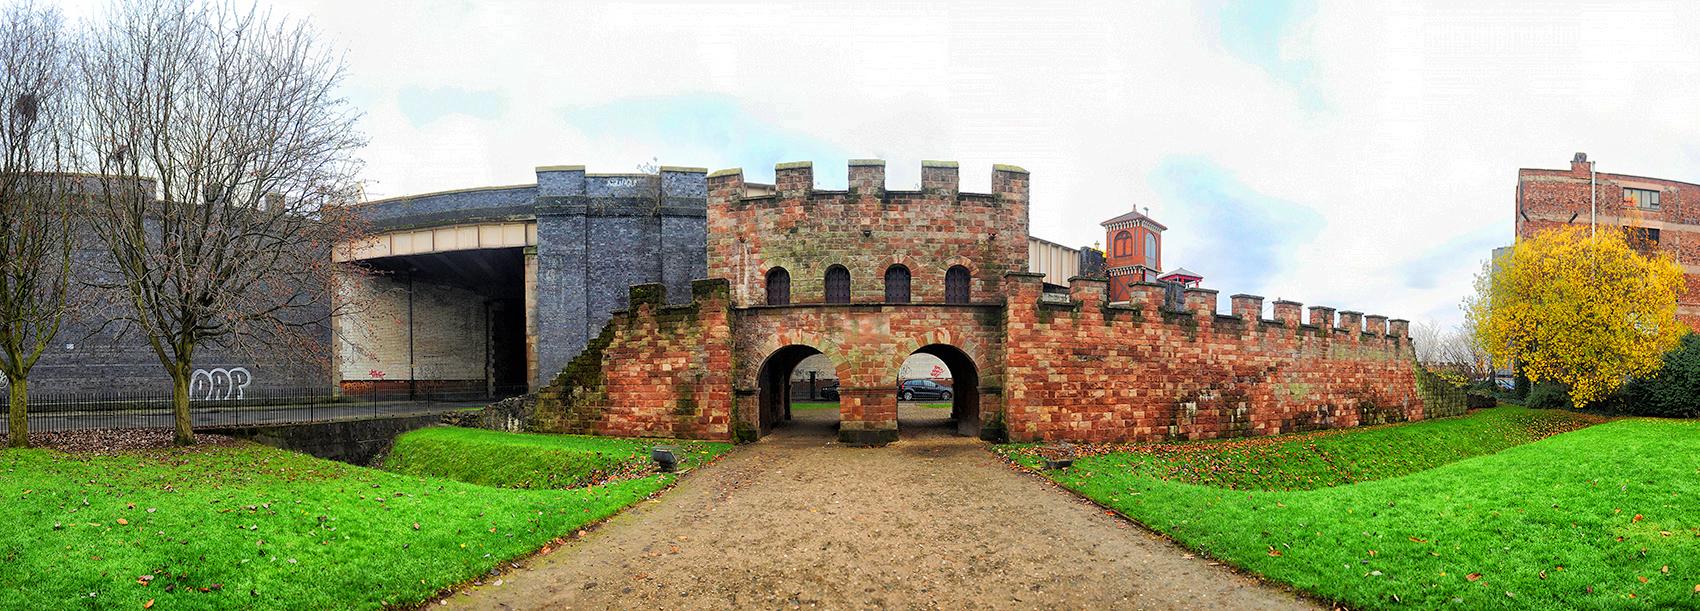 Mamucium Roman fort in Castlefield Urban Heritage Park, Manchester